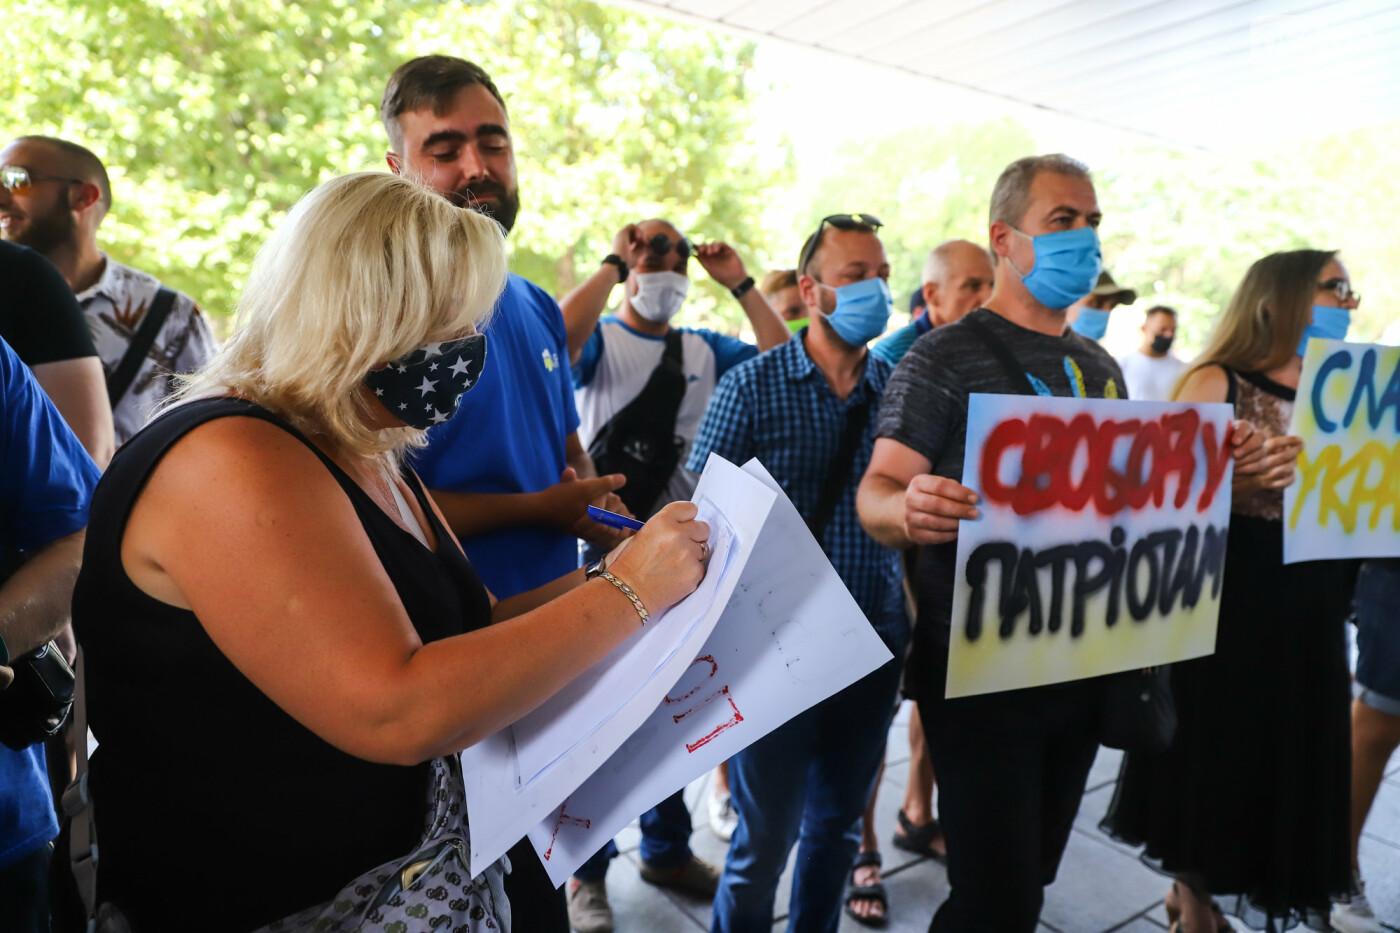 """Захист країни - не злочин"": в Запорожье патриоты провели митинг у стен нацполиции, - ФОТОРЕПОРТАЖ , фото-22"